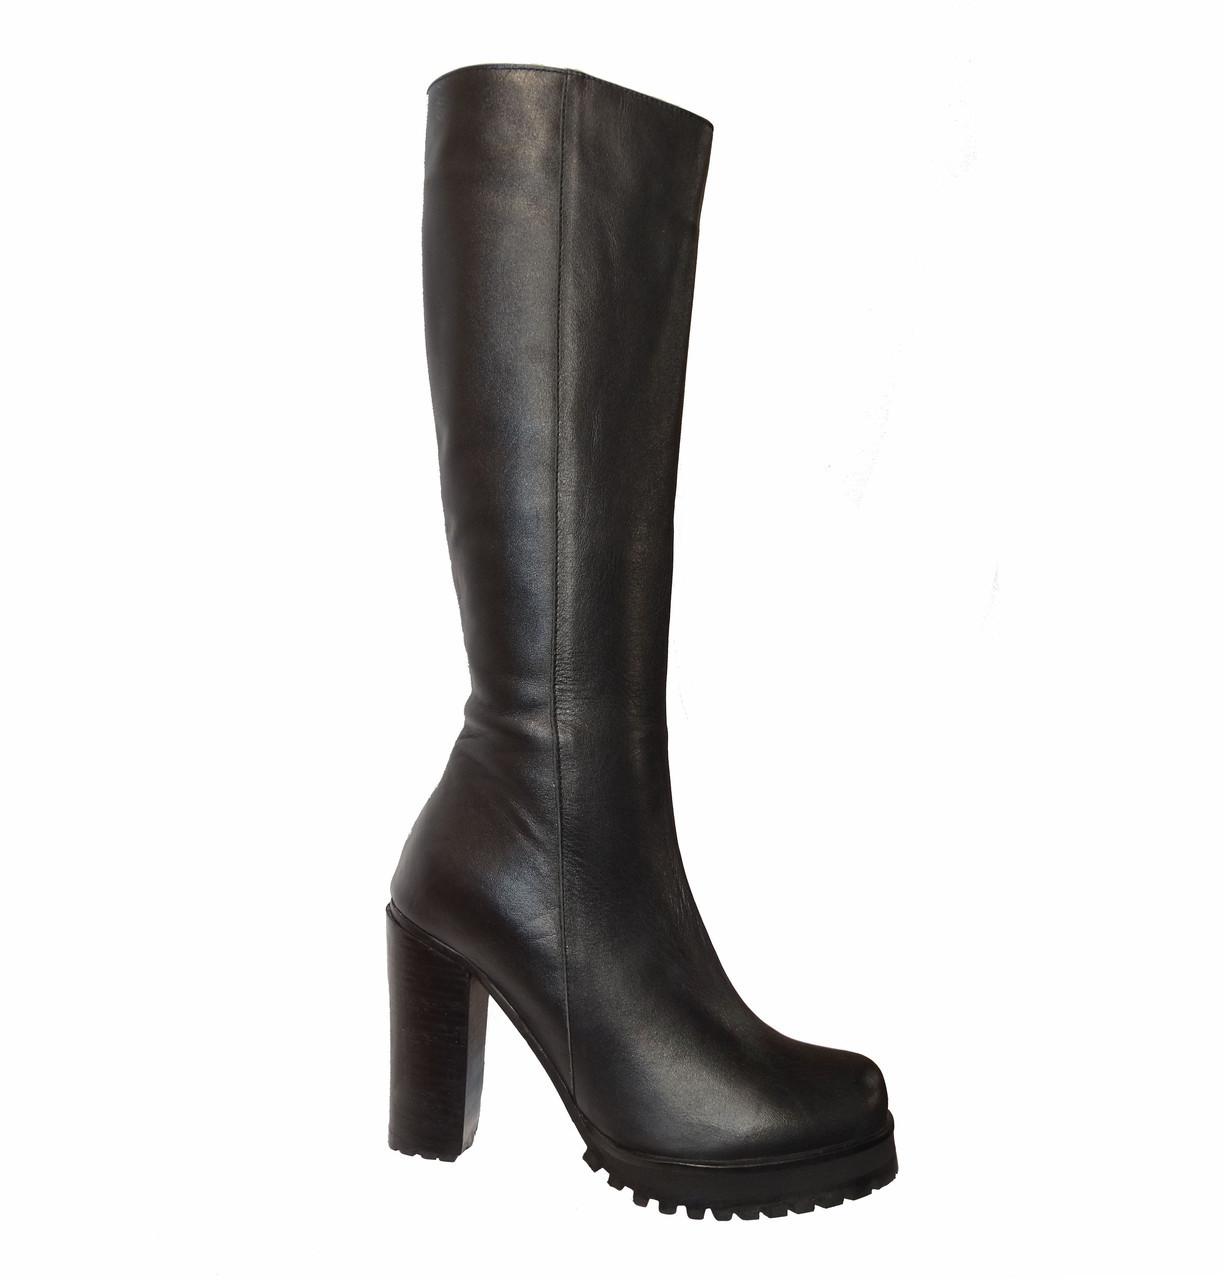 9a3388a7e170 Женские кожаные зимние сапоги на каблуке Tucino №101-1143